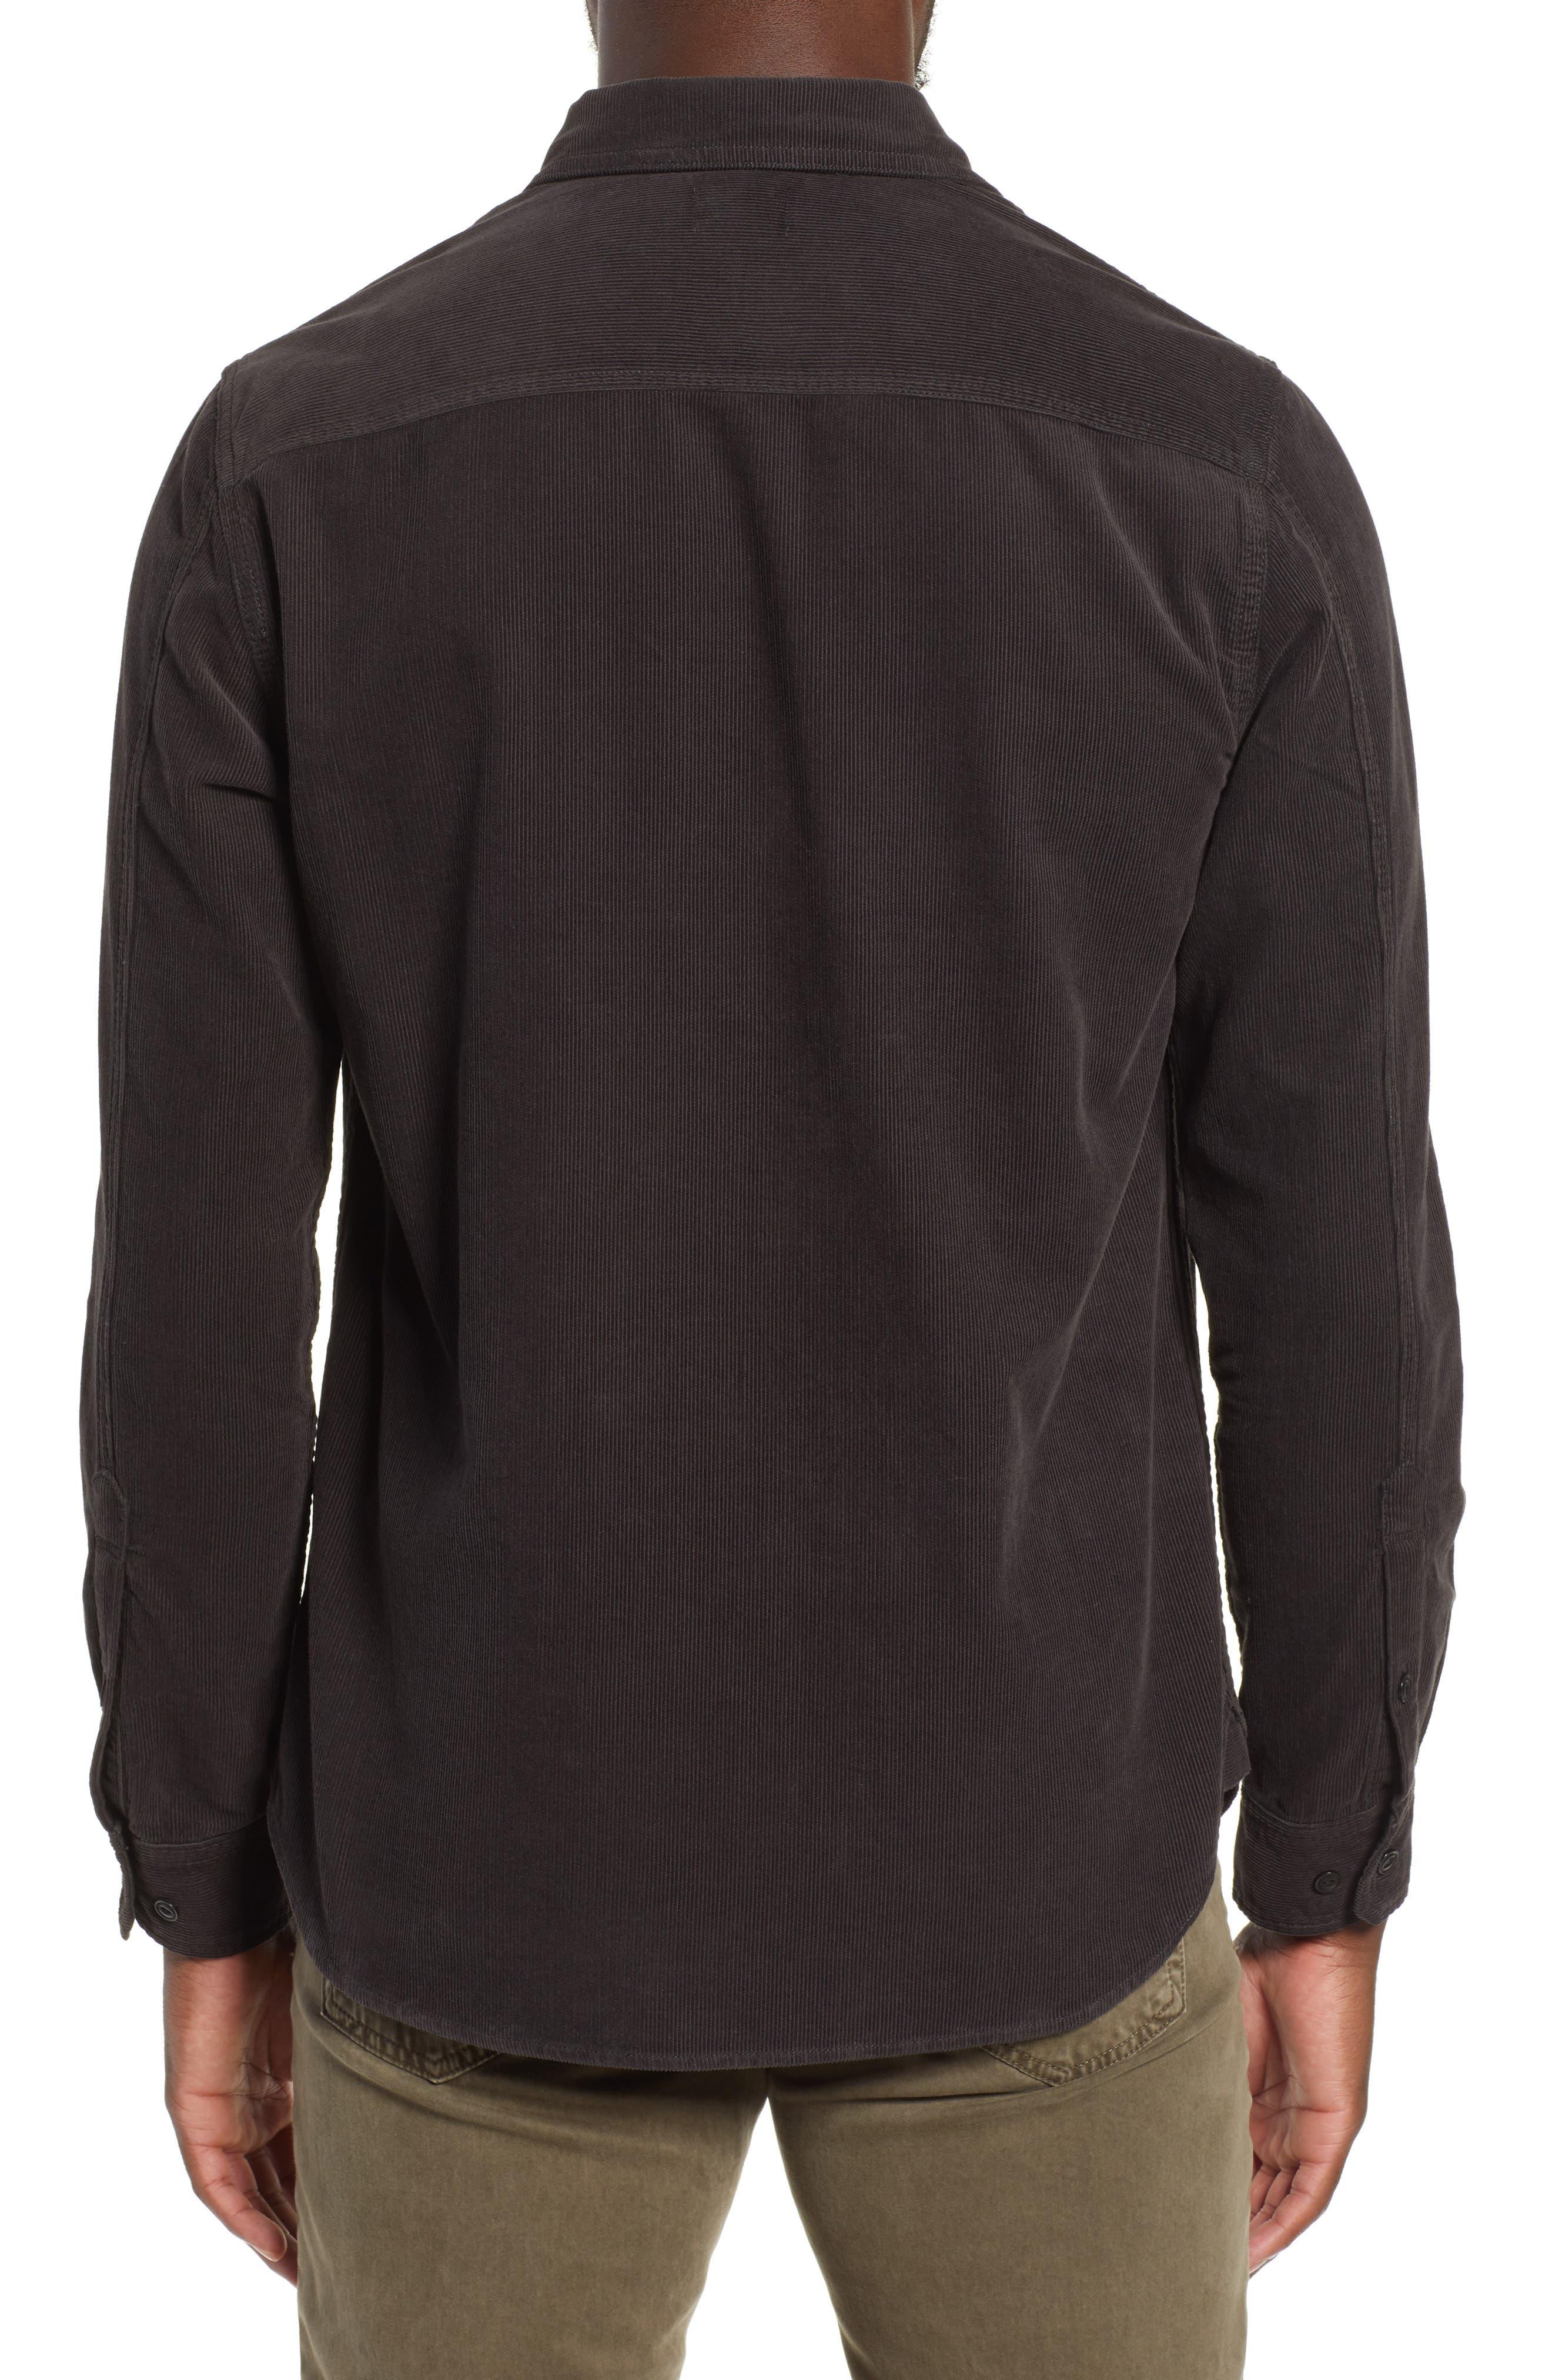 Benning Slim Fit Utility Shirt,                             Alternate thumbnail 3, color,                             GRAY STONE